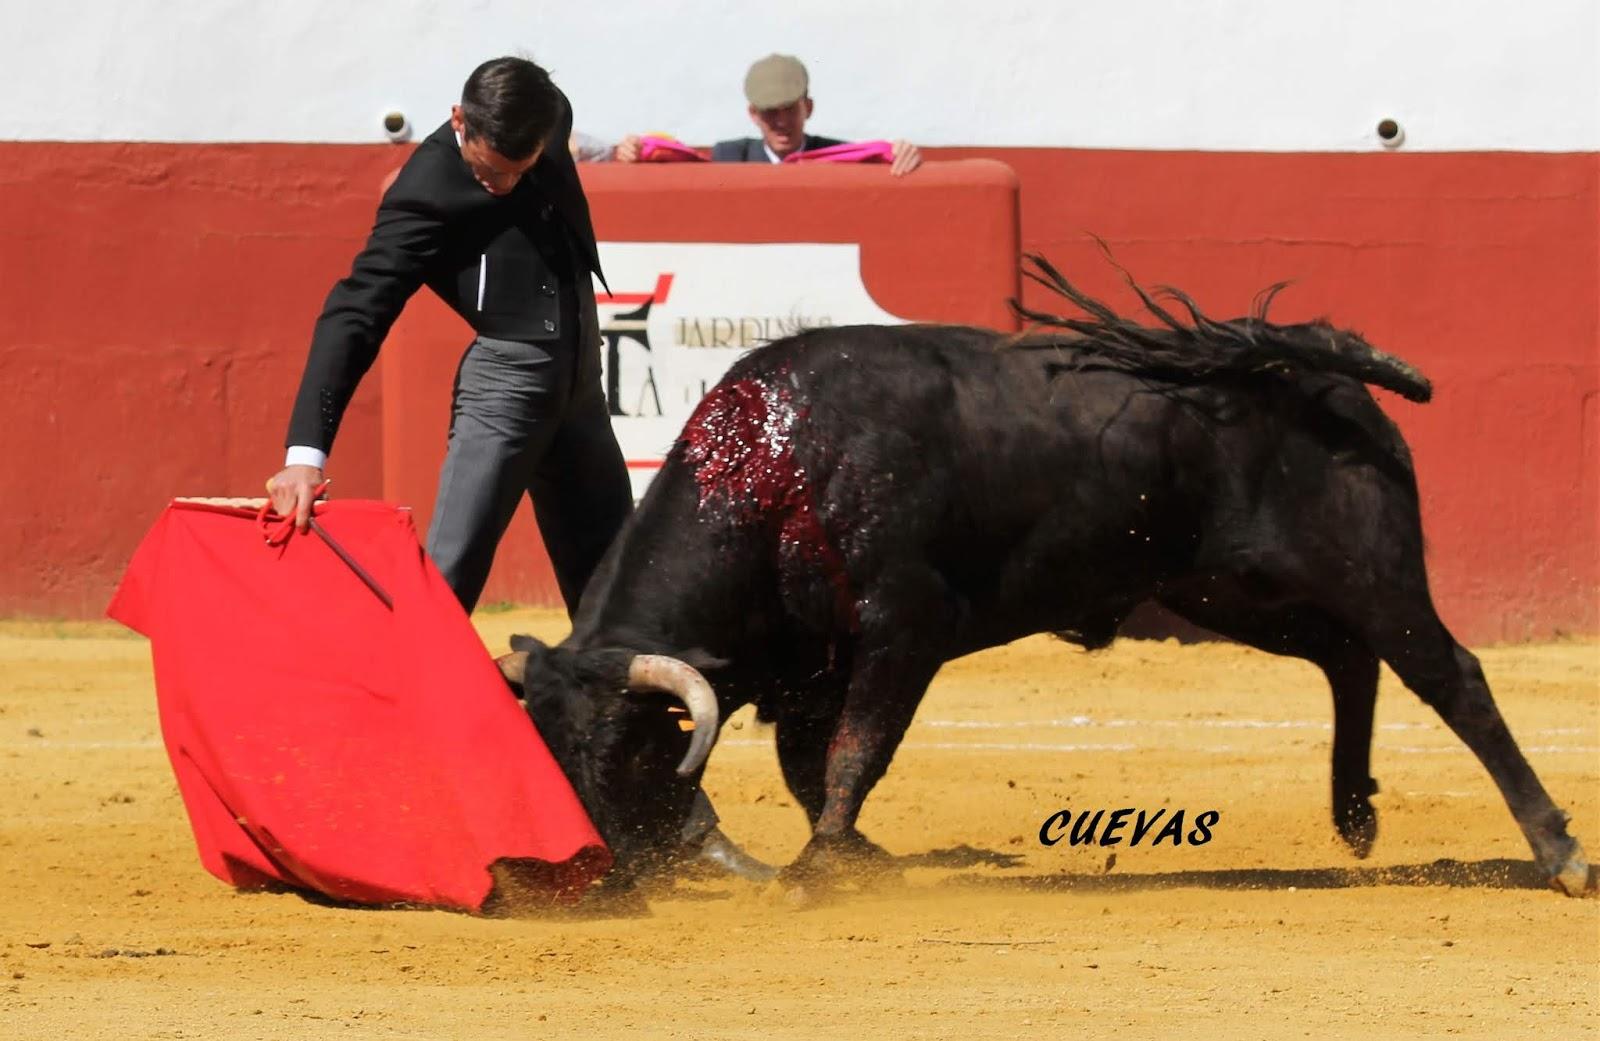 Una jornada inolvidable en Córdoba con el torero Juan Ortega